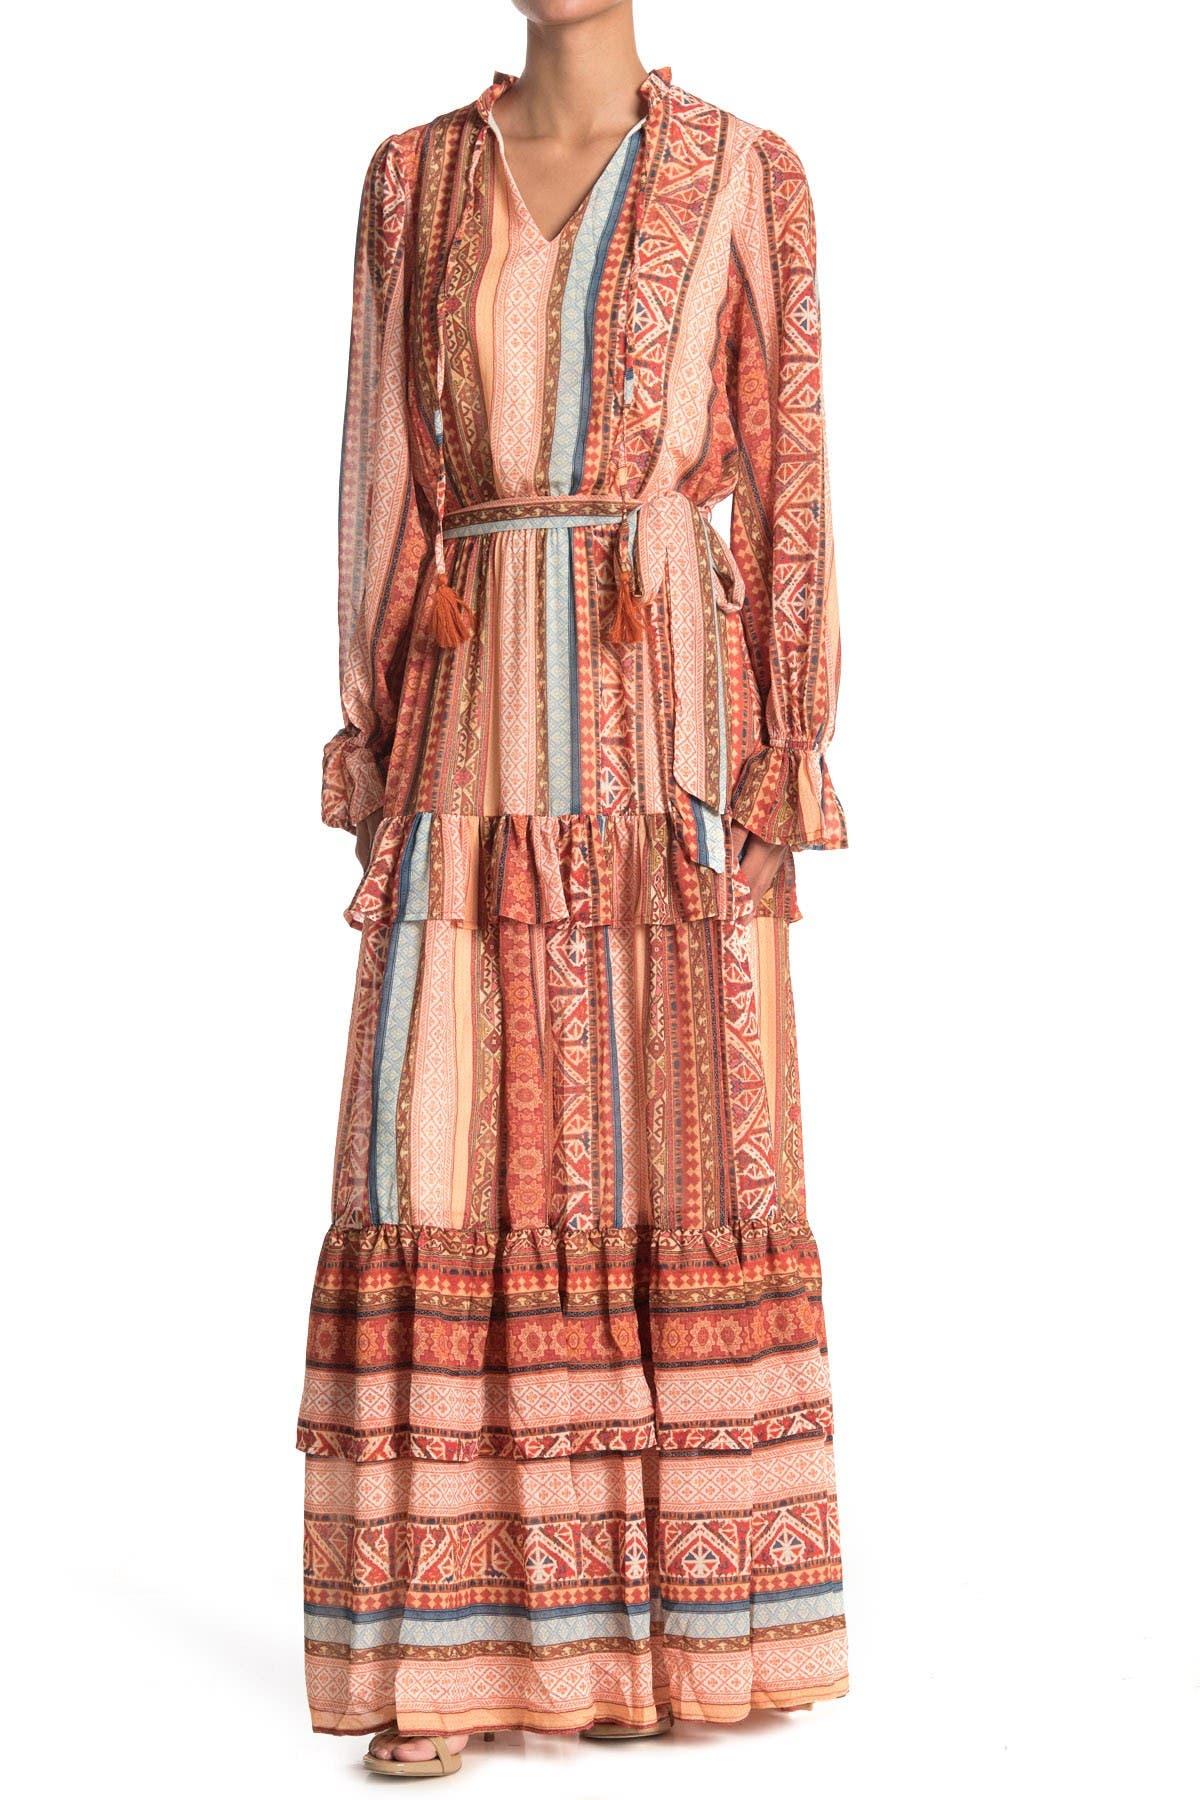 Image of Flying Tomato Printed Maxi Dress